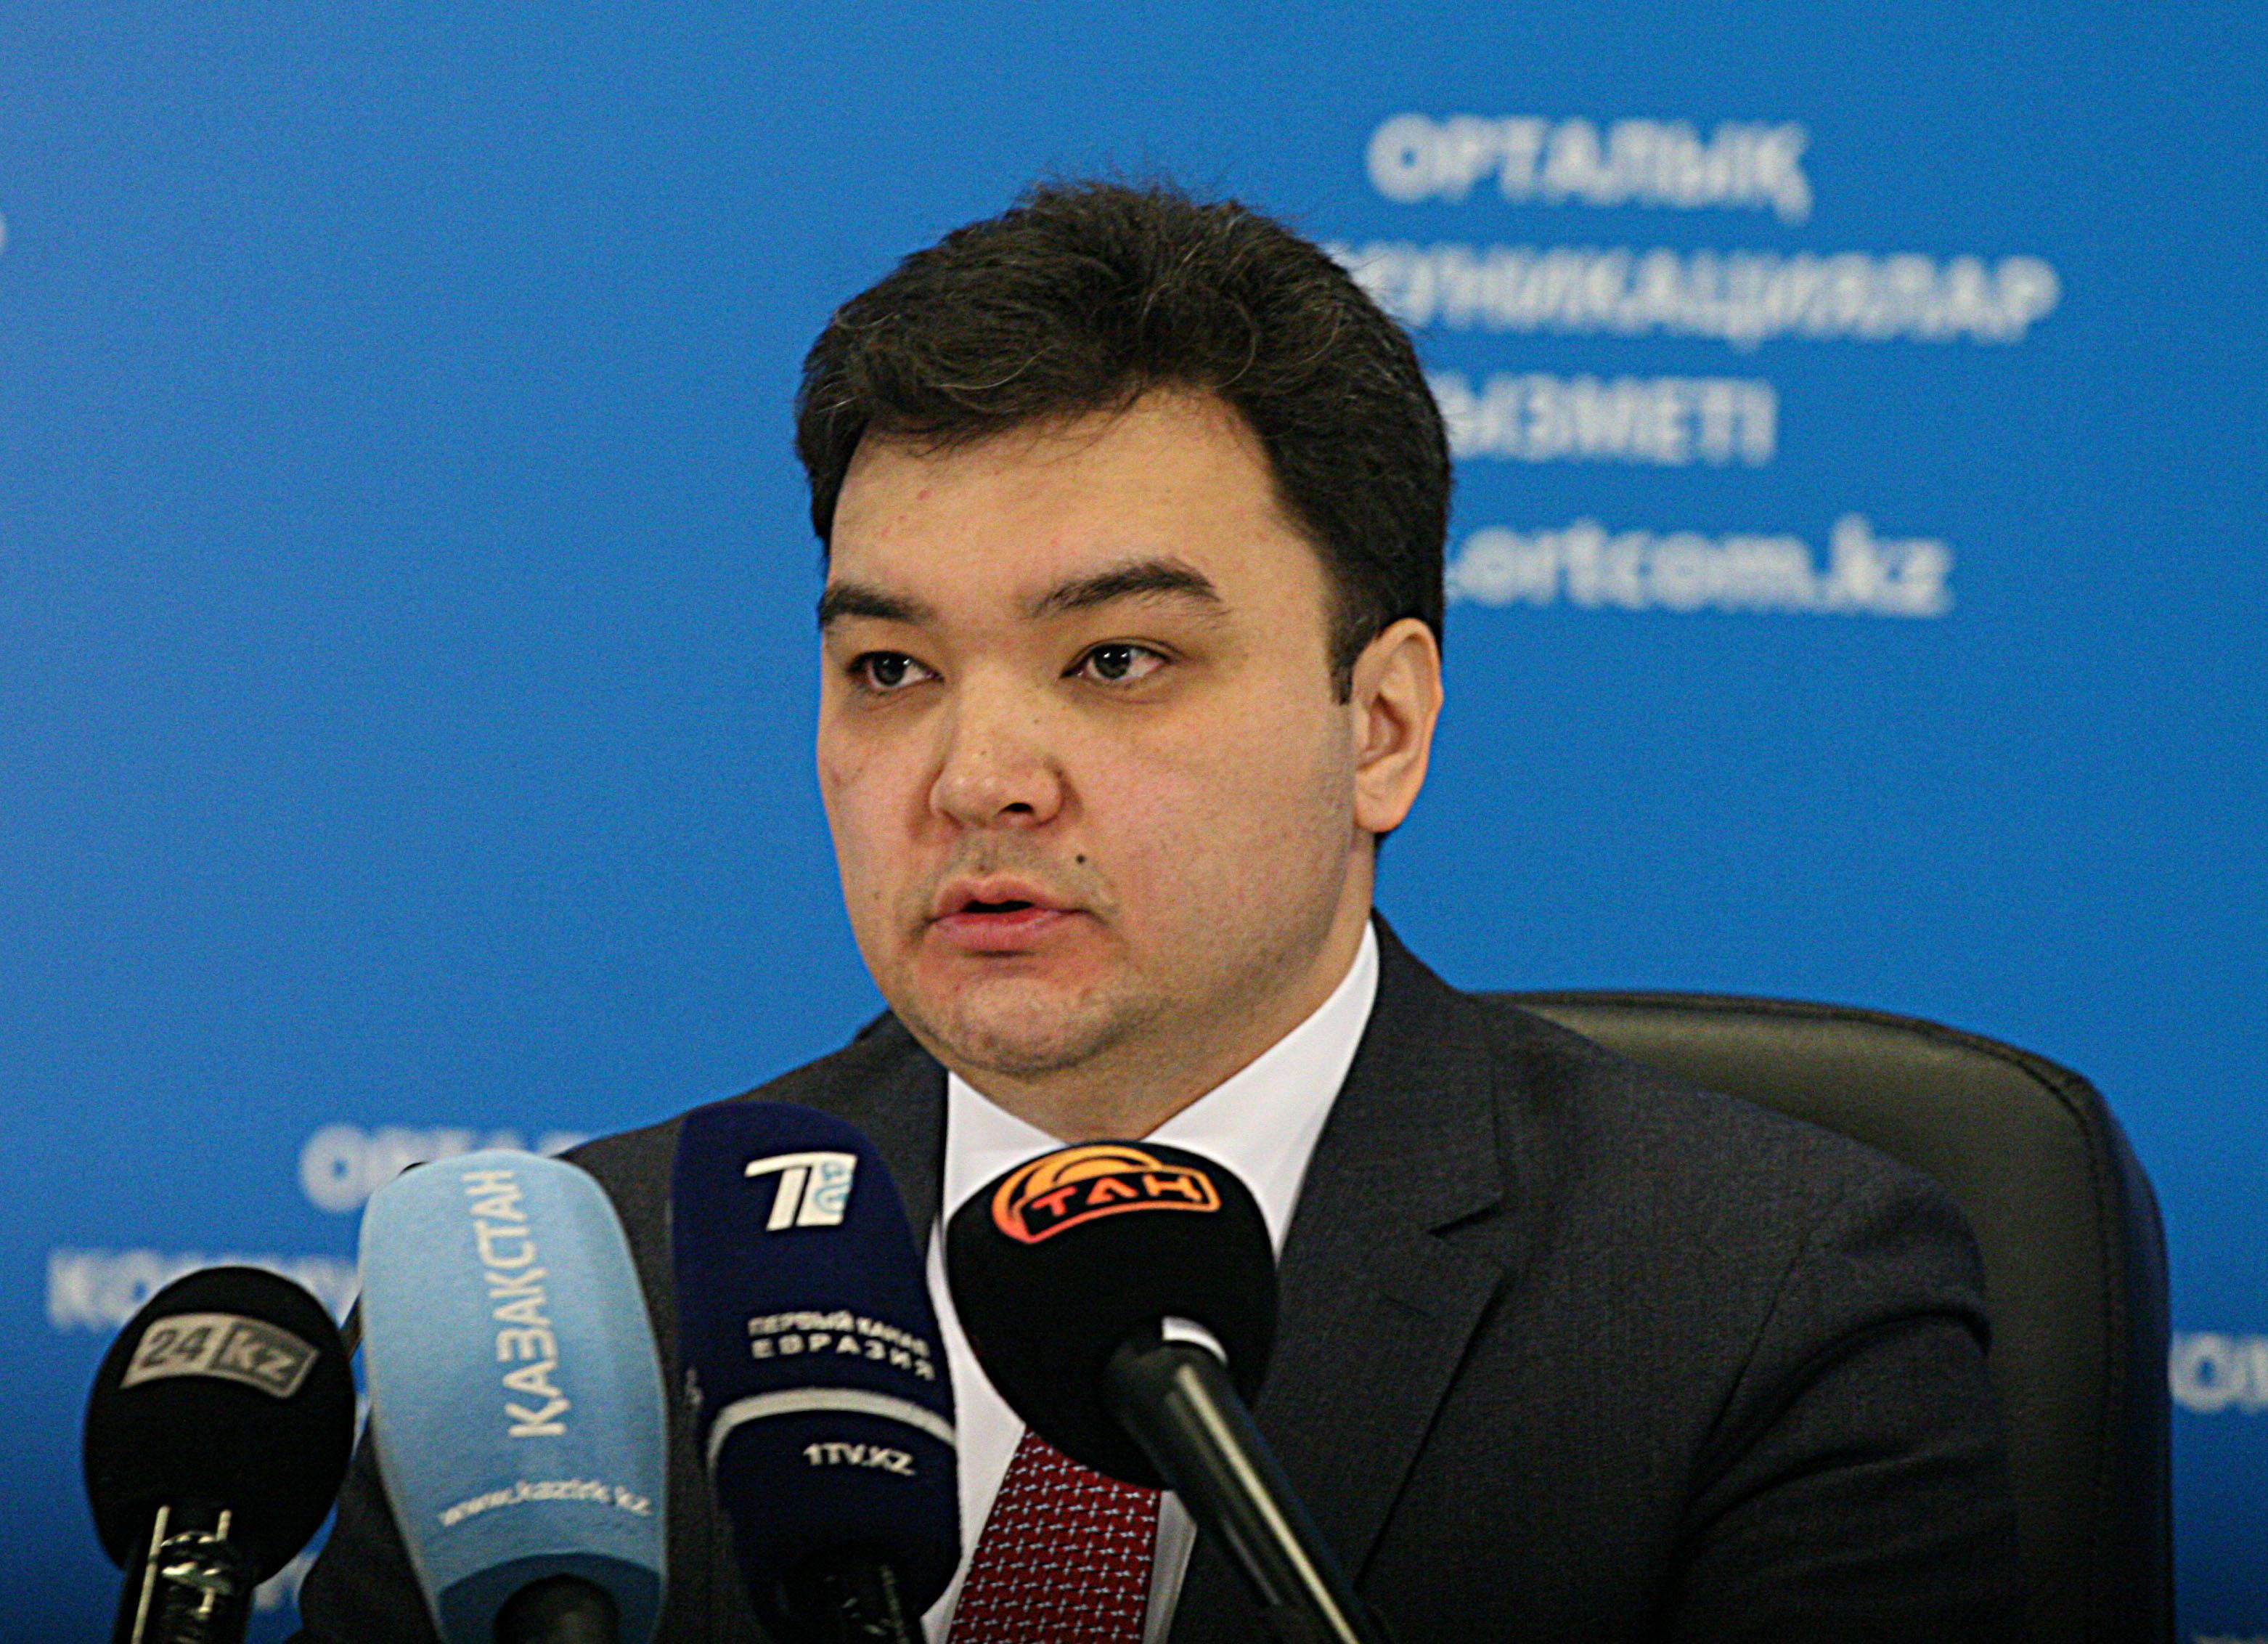 Досье: Махажанов Даурен Сабитович ,  акимат города Кетау